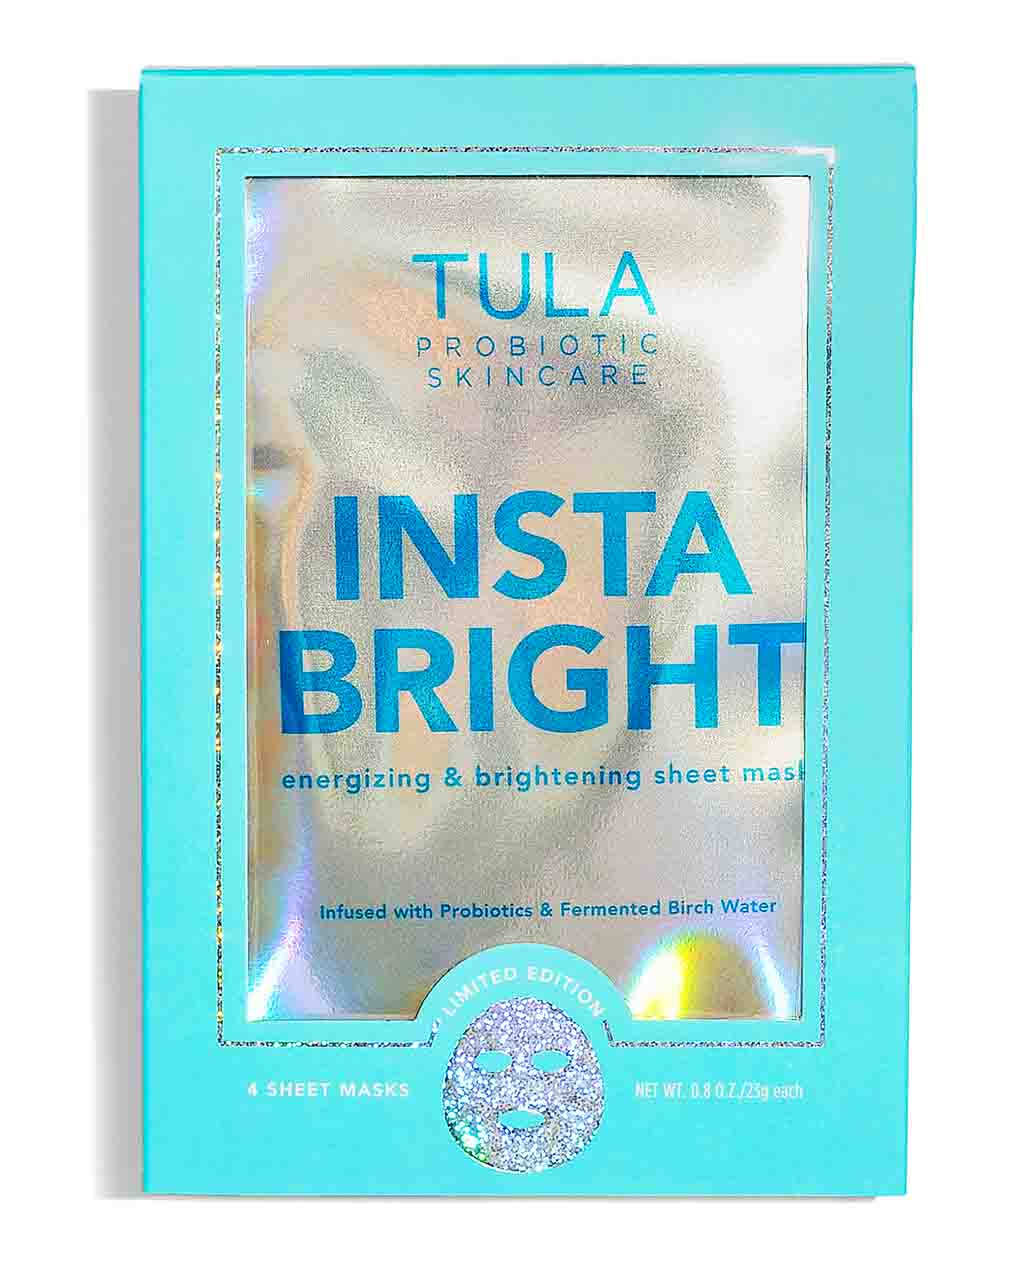 tula.com - Insta Bright Energizing & Brightening Sheet Mask